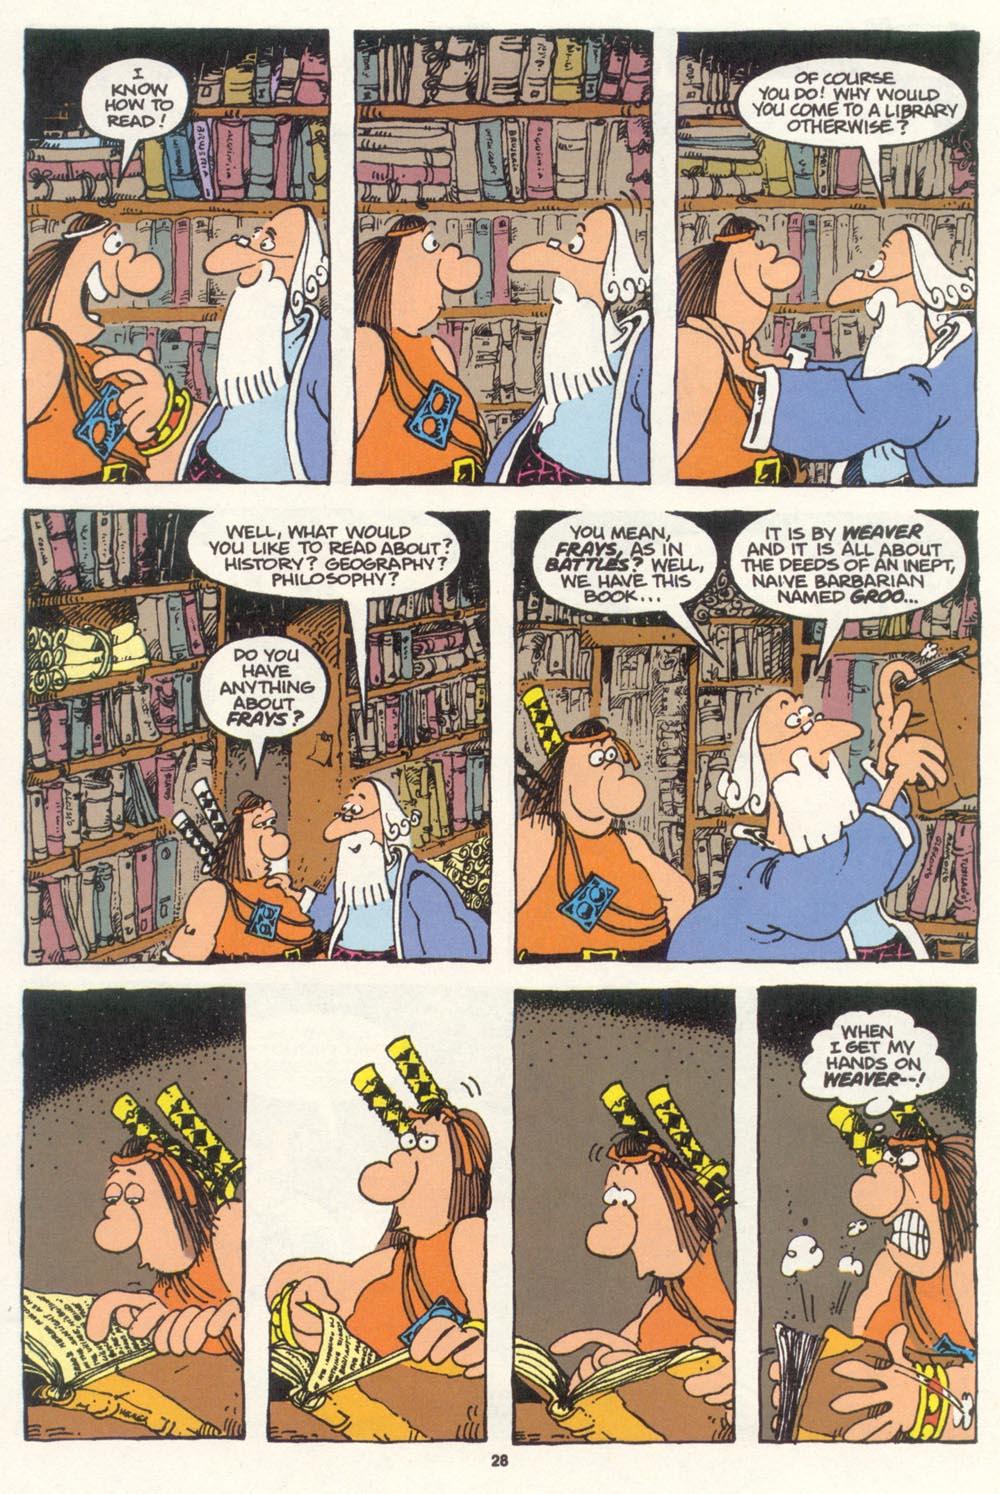 Read online Sergio Aragonés Groo the Wanderer comic -  Issue #100 - 29